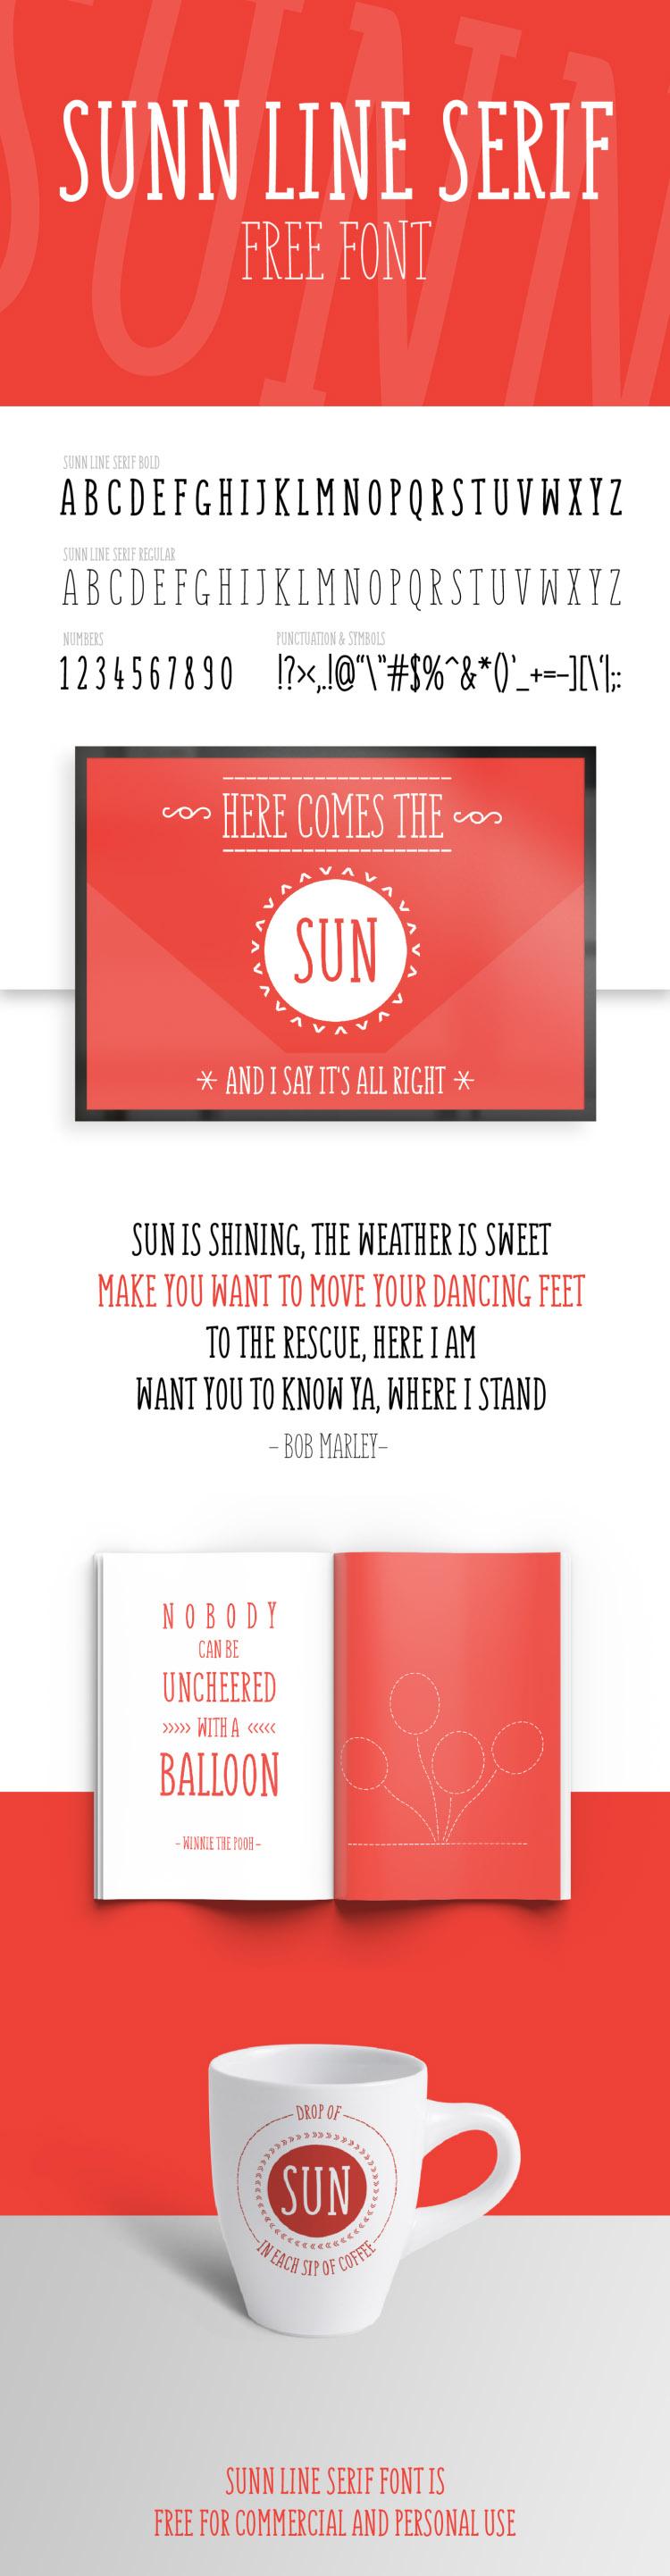 SUNN Line Serif Free Font 2